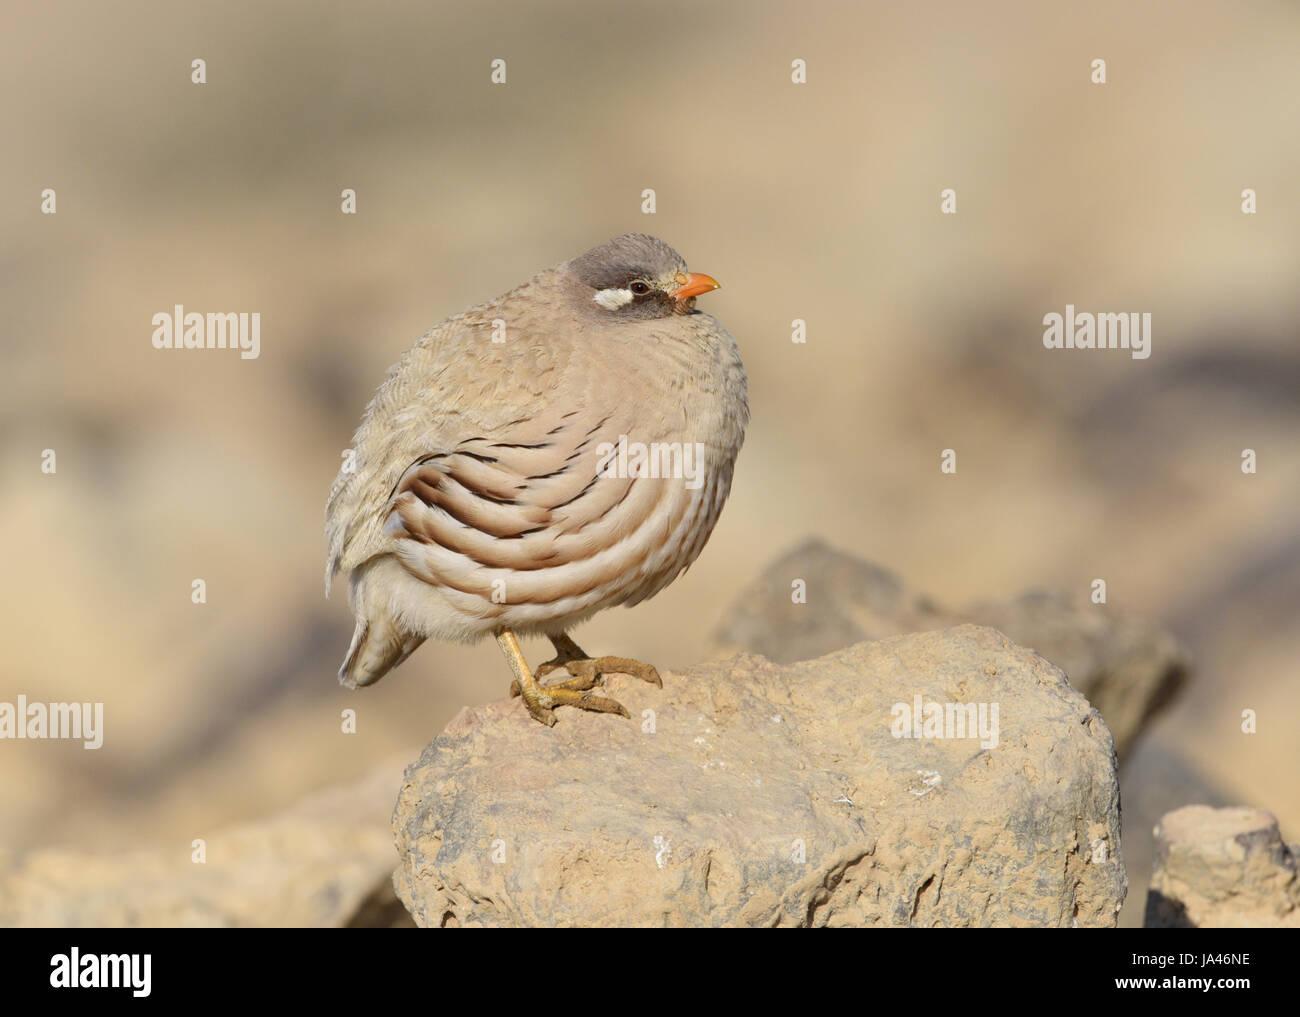 Sand Partridge - Ammoperdix heyi Stock Photo